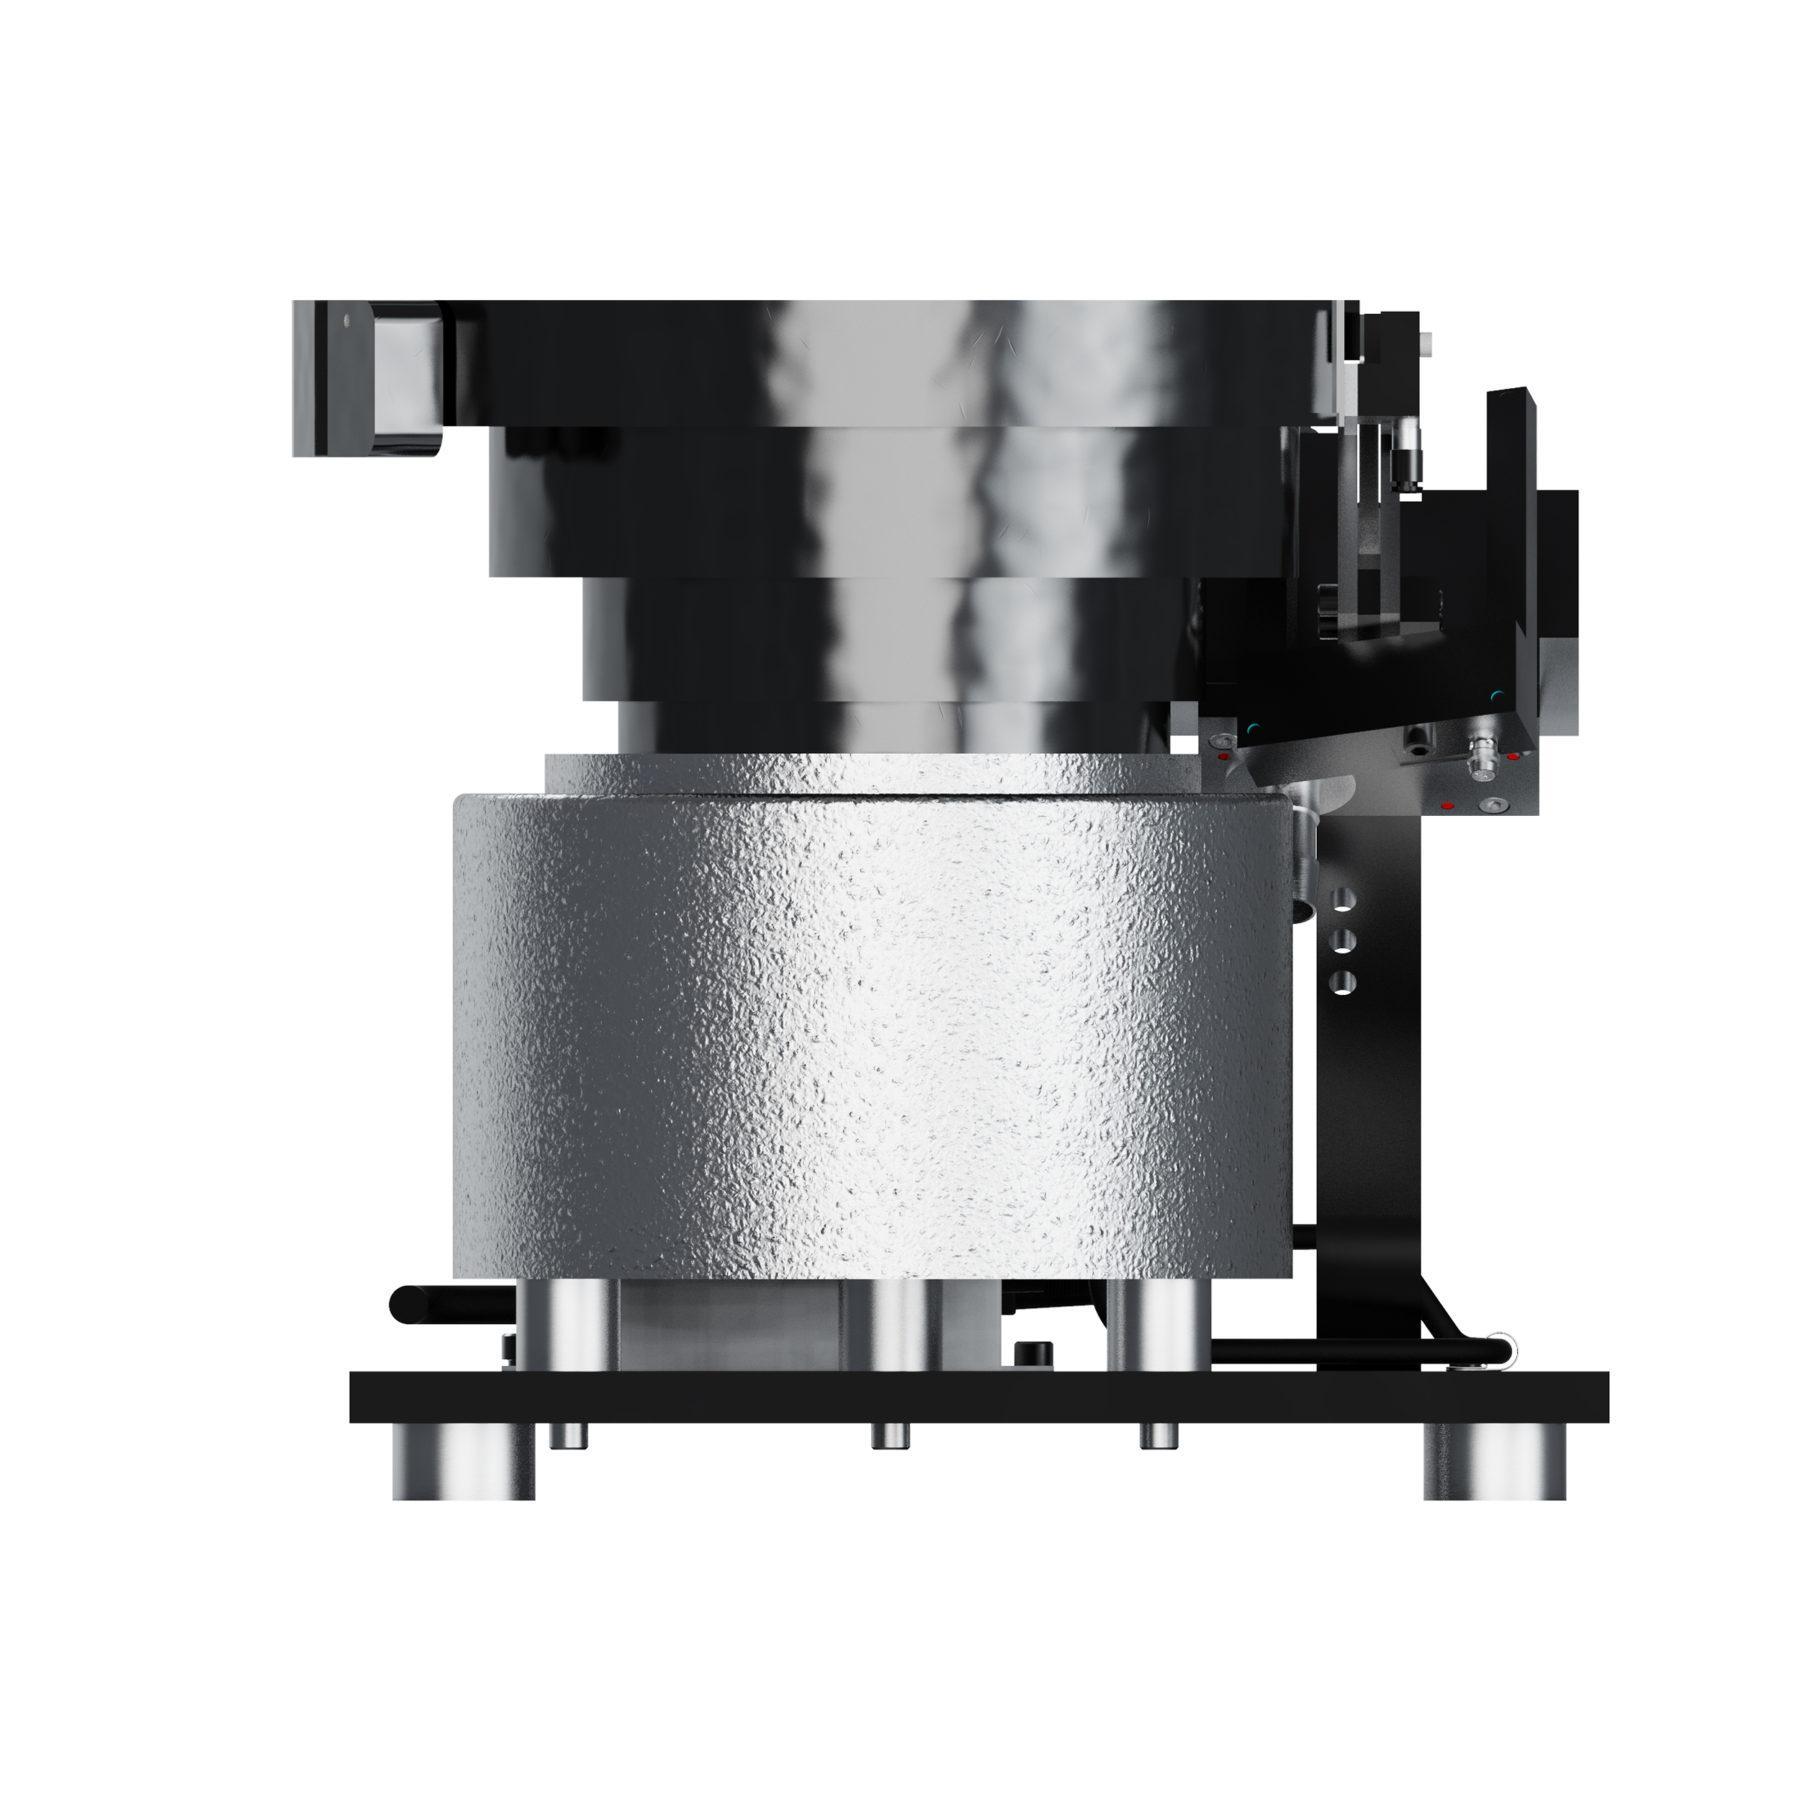 A10 Vibratory Bowl Screw Feeder Carlson Engineering Side 3